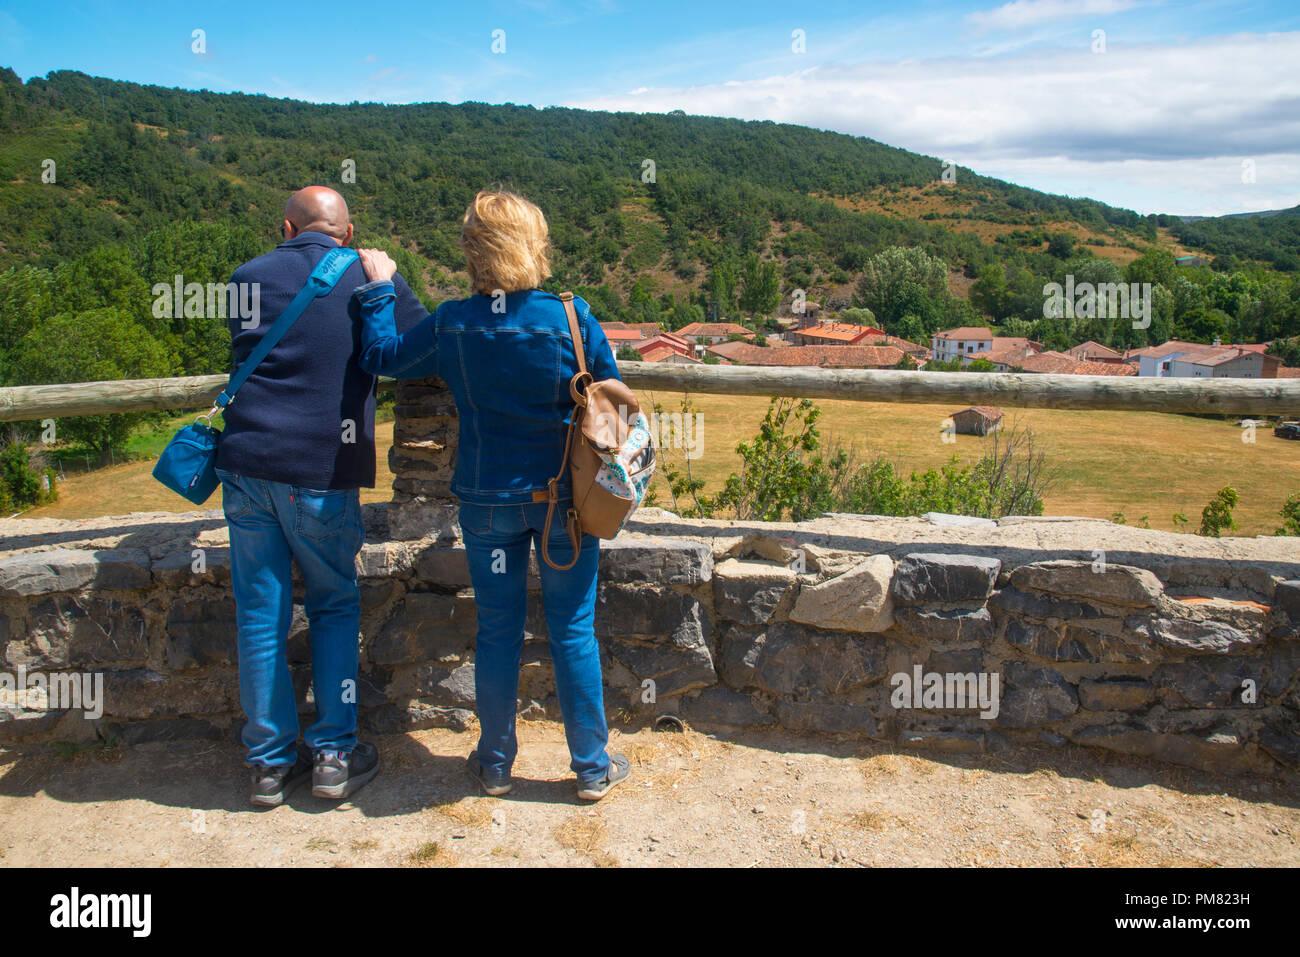 Mature couple at the viewpoint. Ruesga, Palencia province, Castilla Leon, Spain. - Stock Image